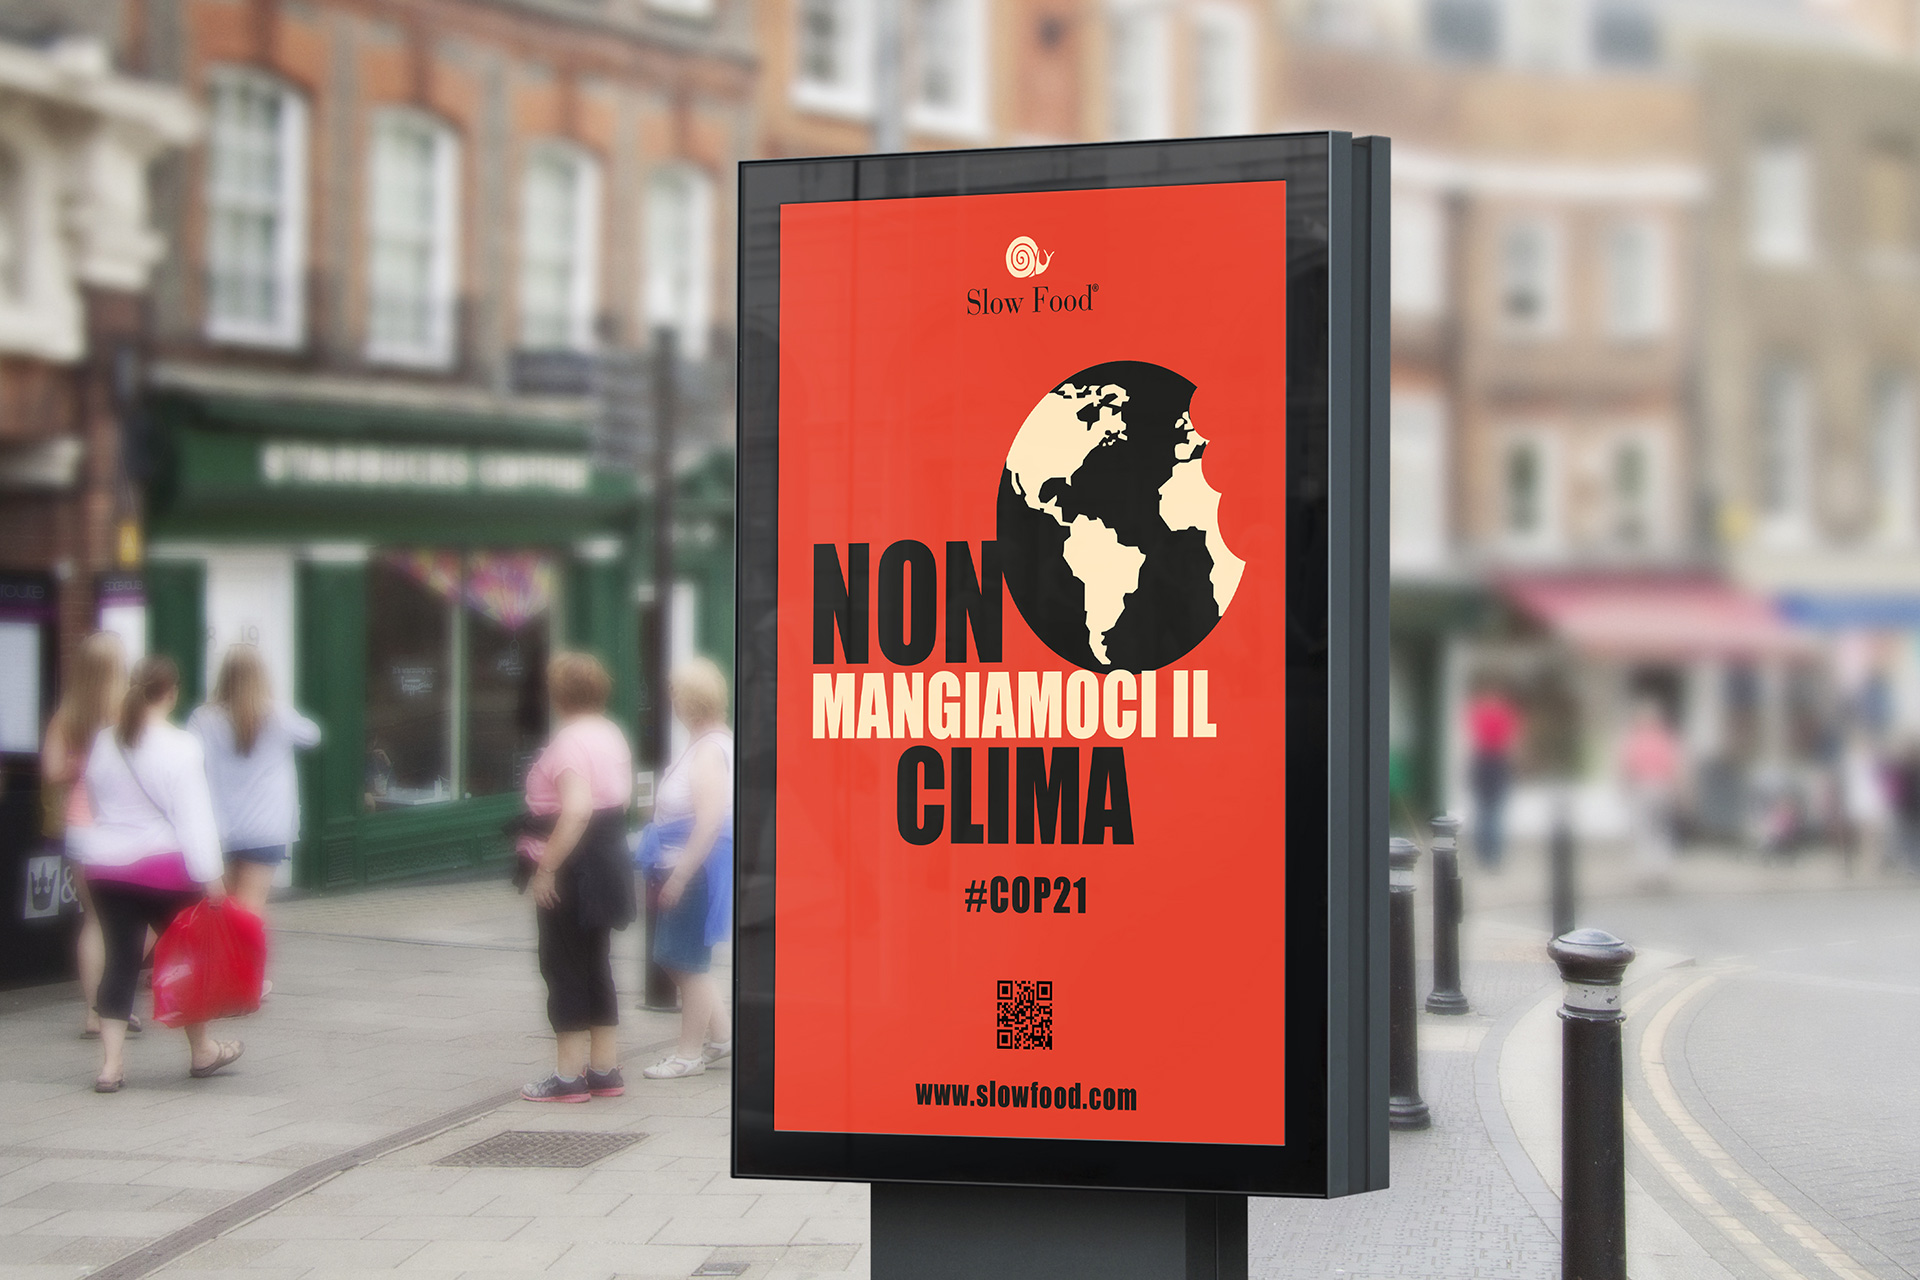 Non mangiamoci il clima / Slow Food